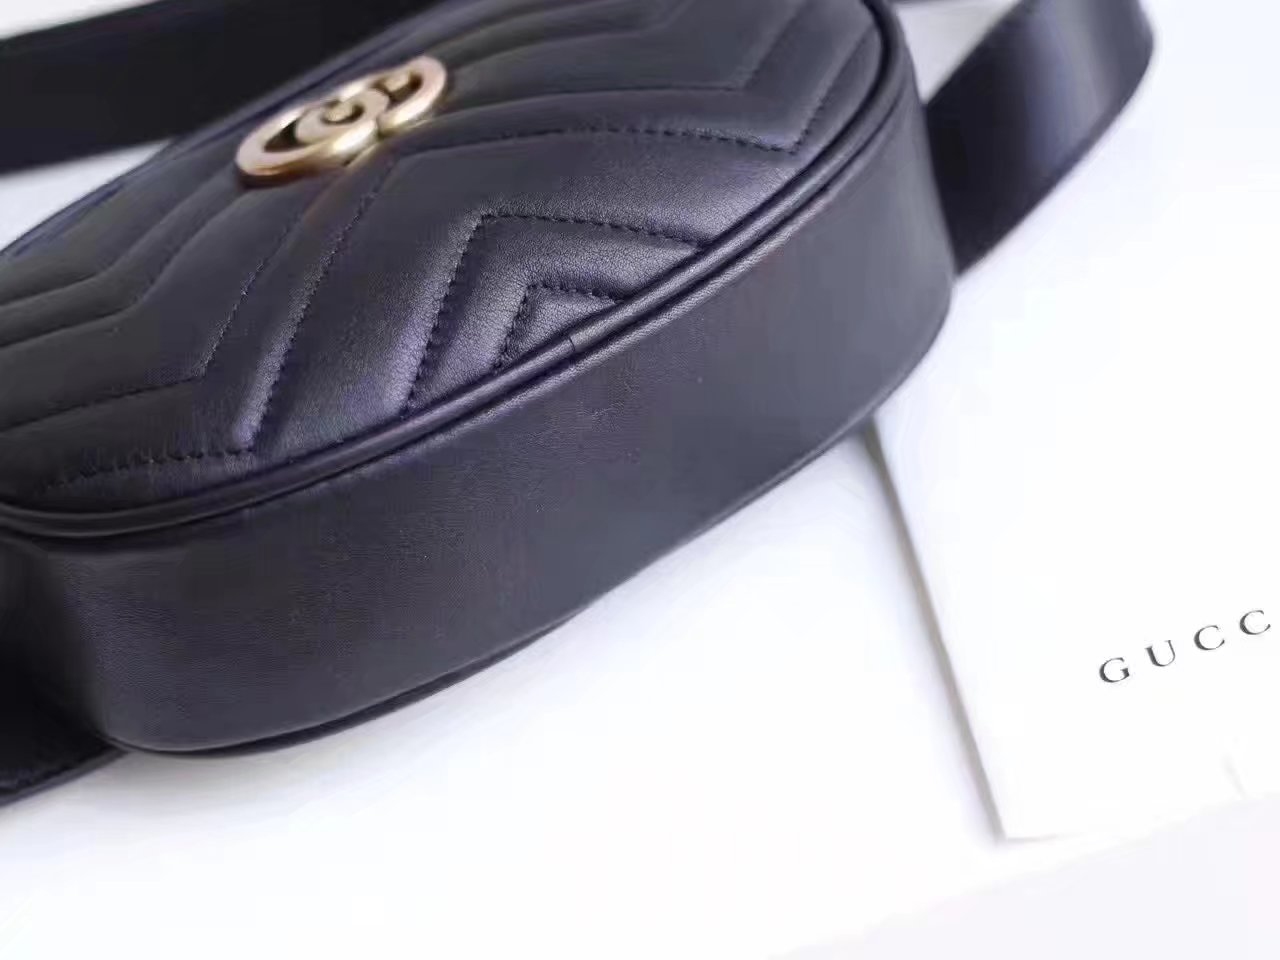 Gucci 476434 GG Marmont Matelasse Leather Belt Bag Black